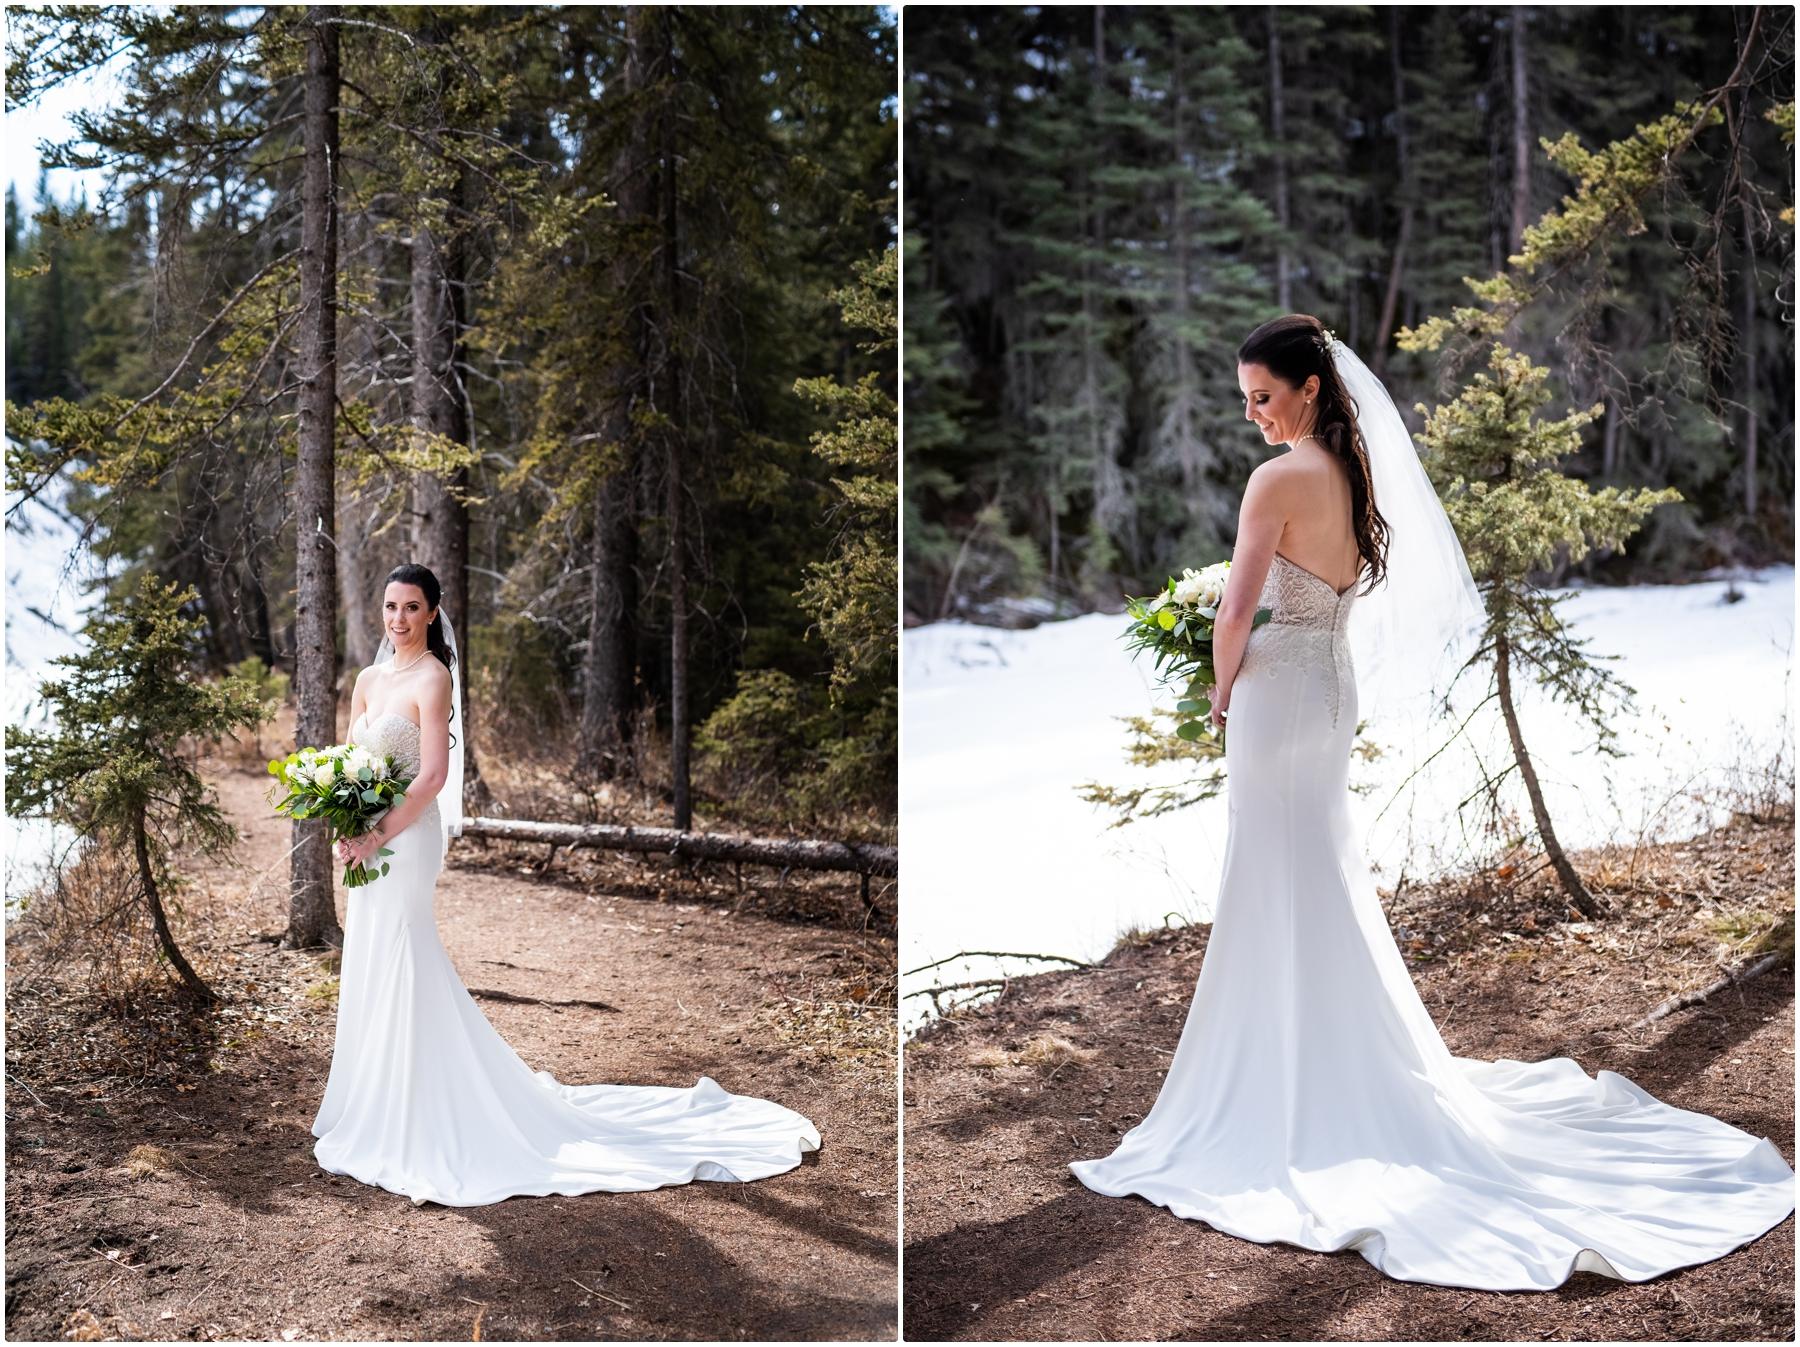 Calgary Wedding Photographer- Formal Bridal Portraits